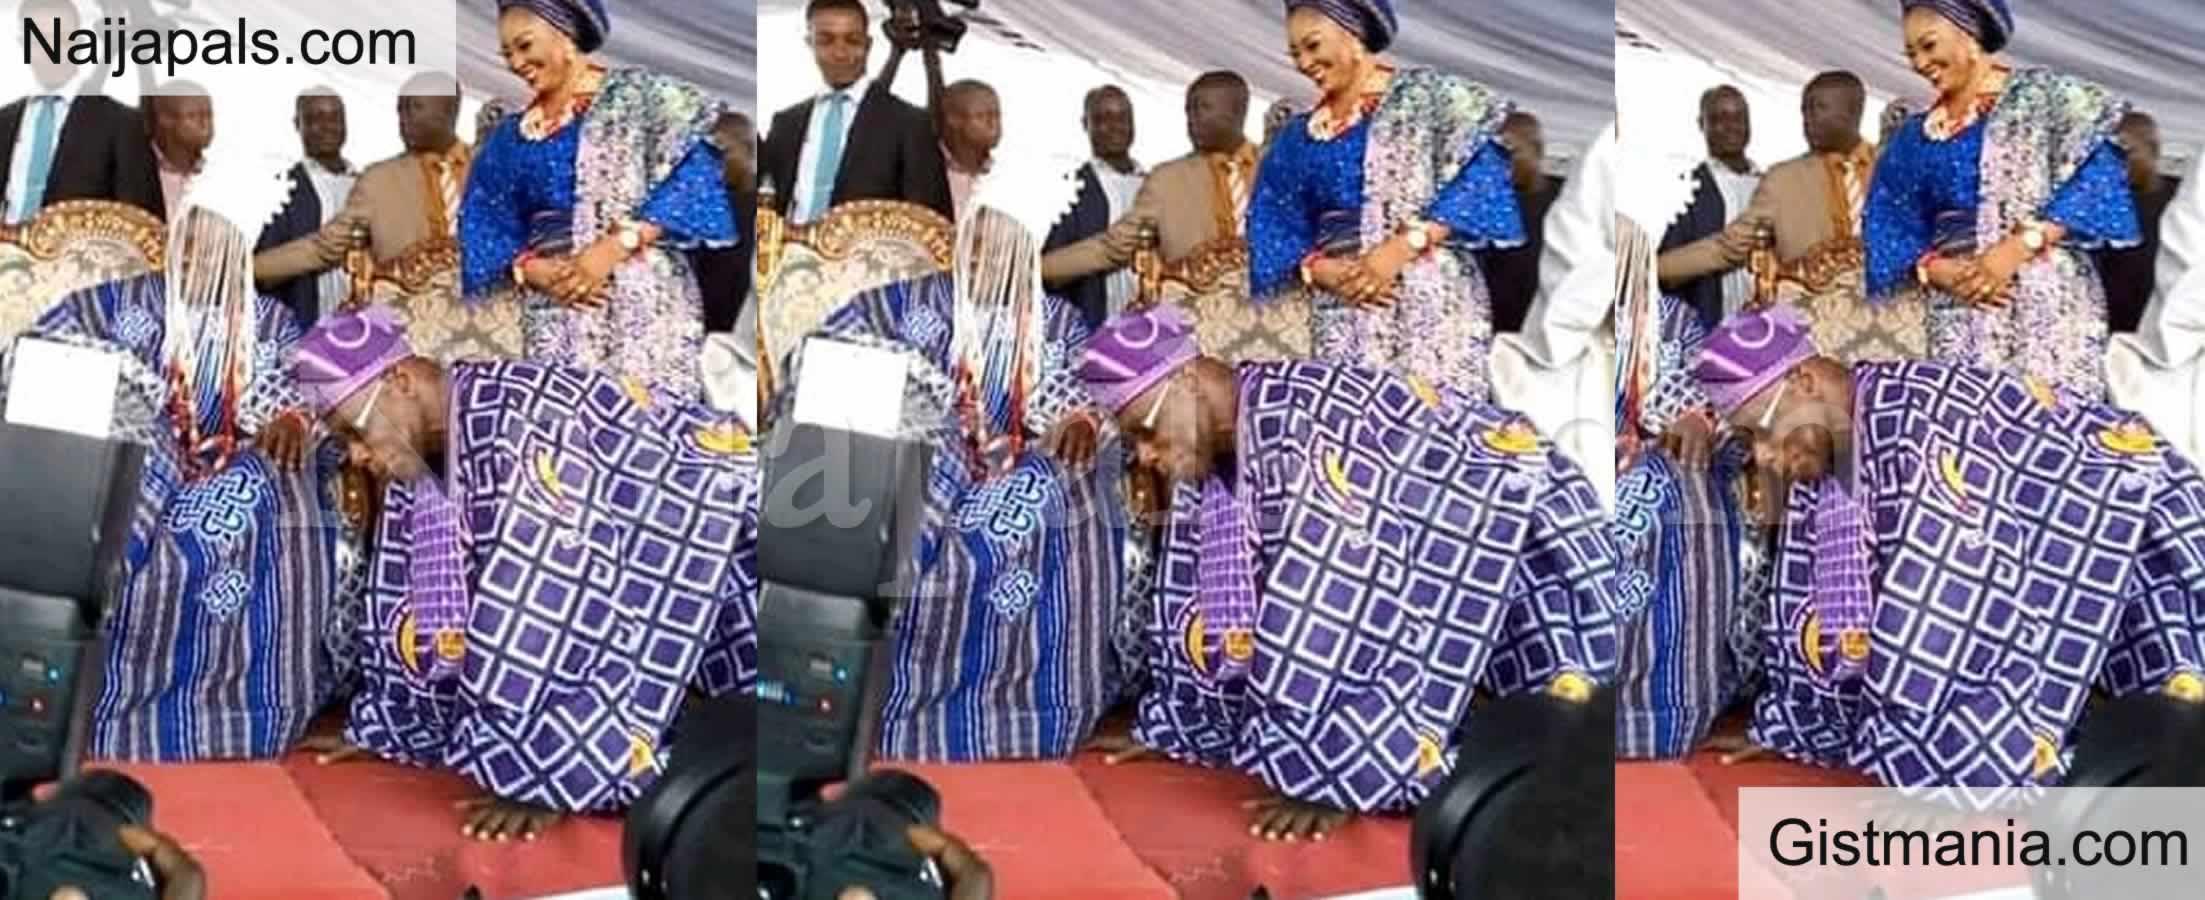 <img alt='.' class='lazyload' data-src='https://img.gistmania.com/emot/comment.gif' /> <b>Ex-President Obasanjo Humbles Self, Prostrates Before 59-Year-Old King In Abeokuta</b> (Photo)